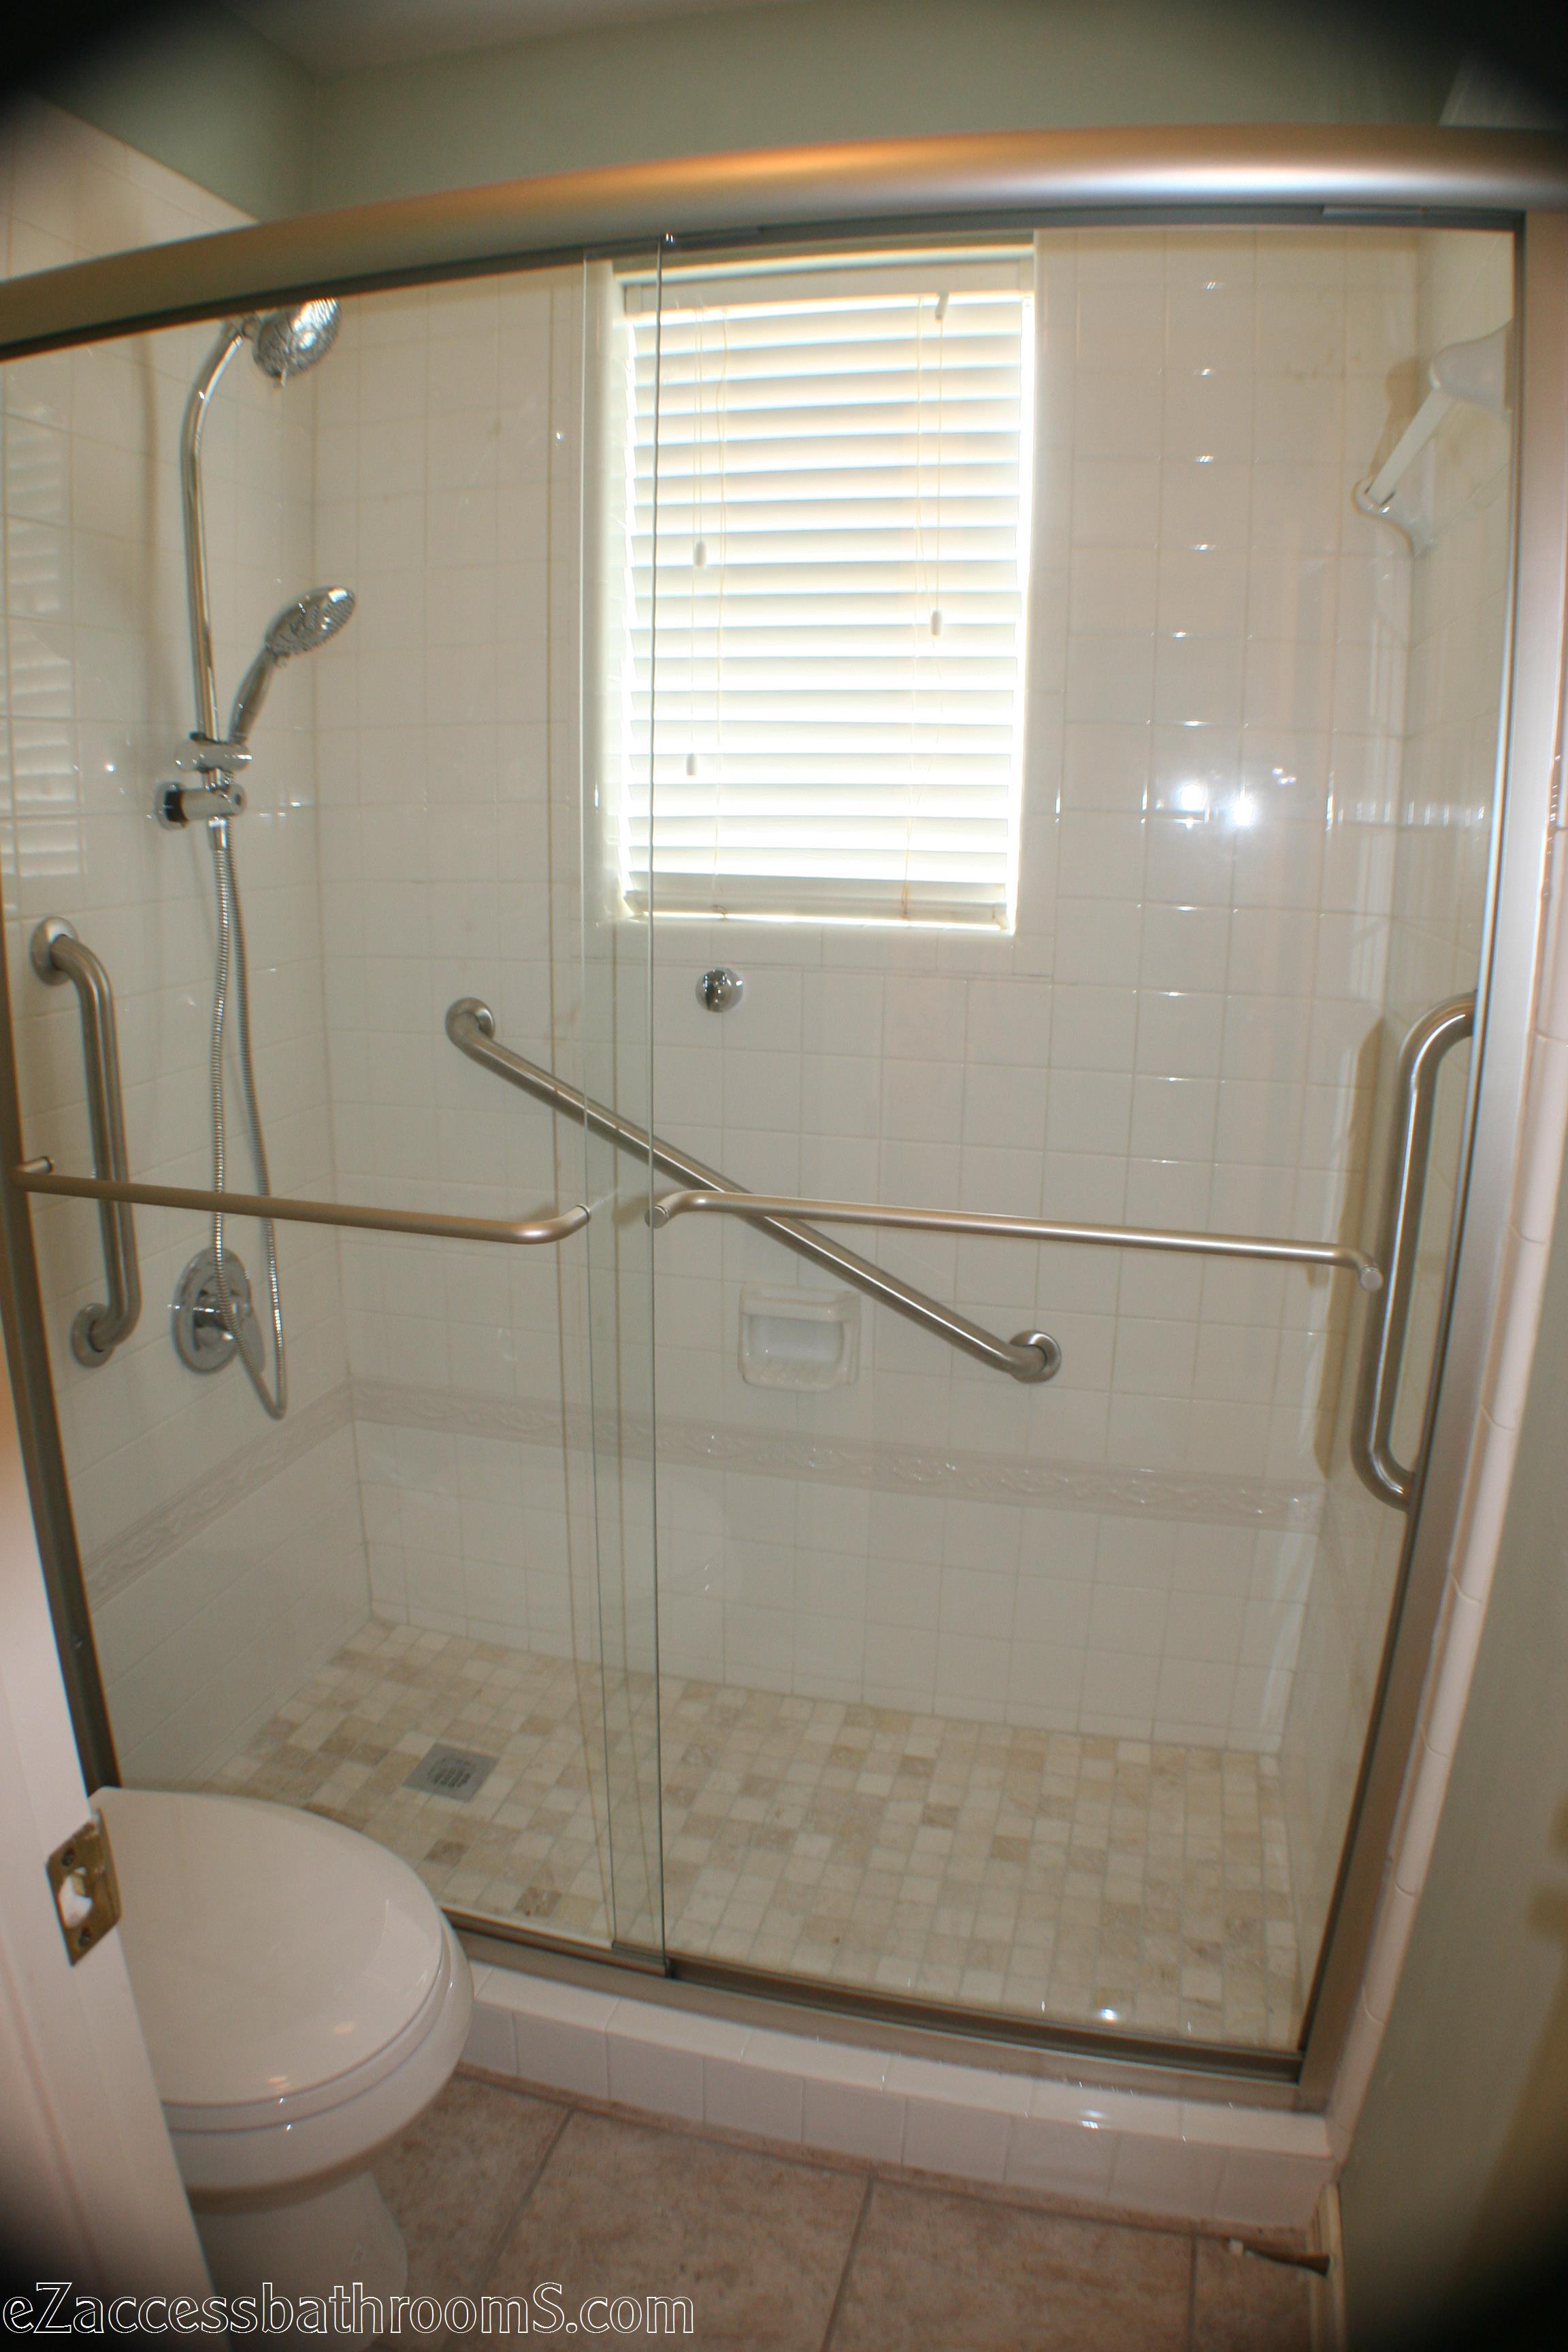 Budget tub to shower conversion ezaccessbathrooms.com 8322028473 001 - Copy.JPG